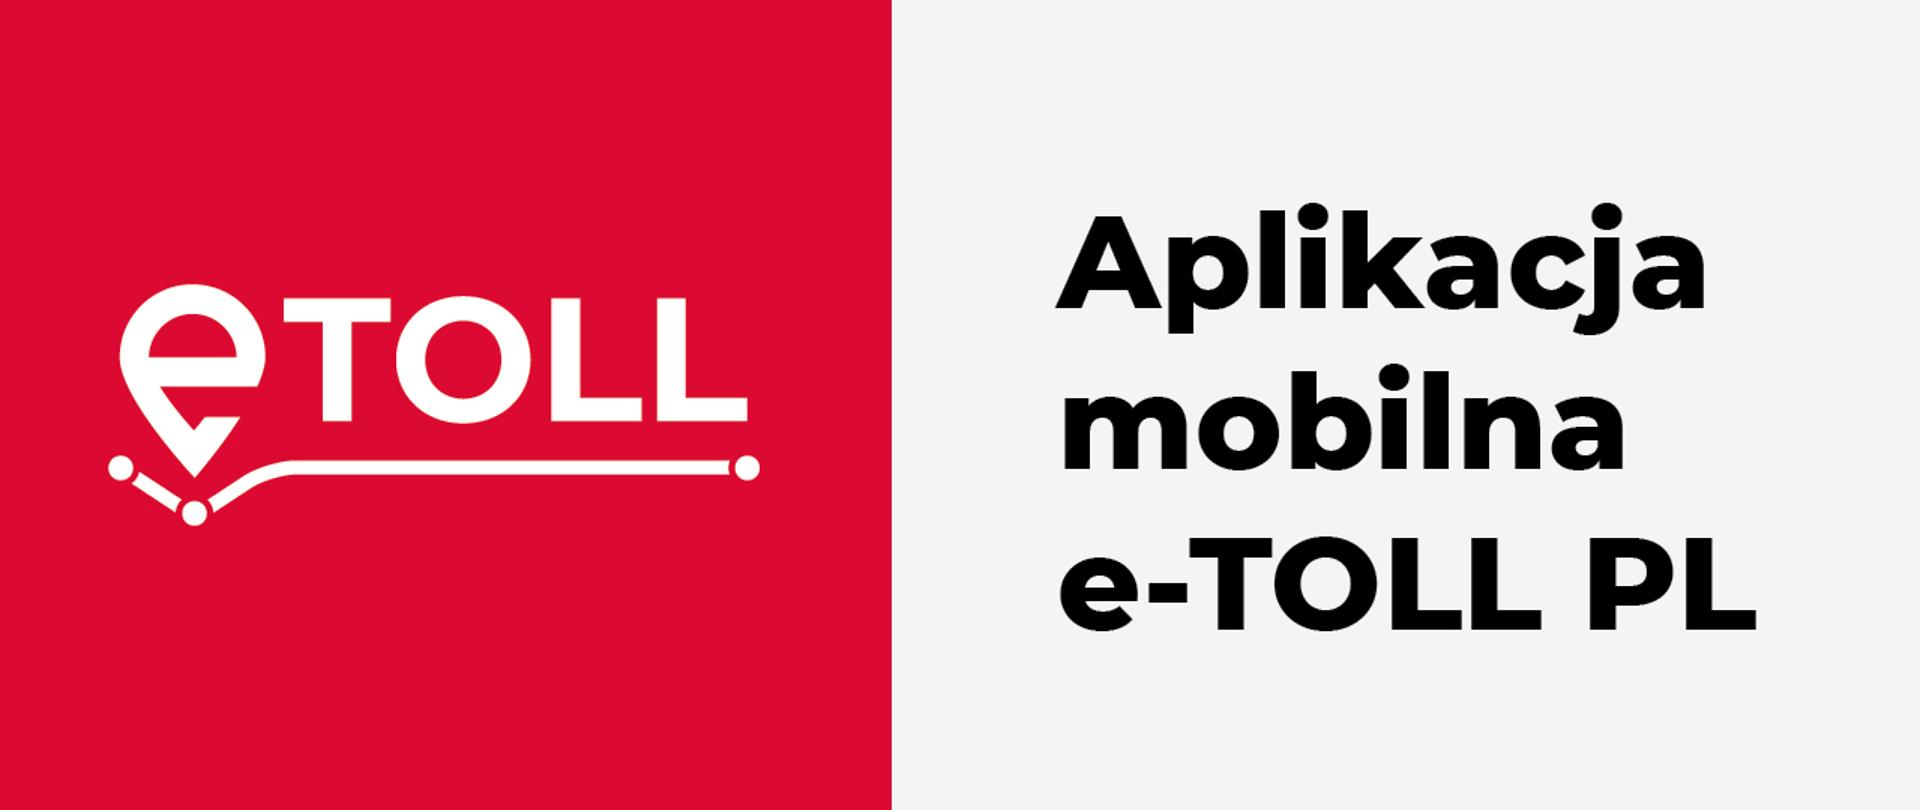 apliakcja-e-toll